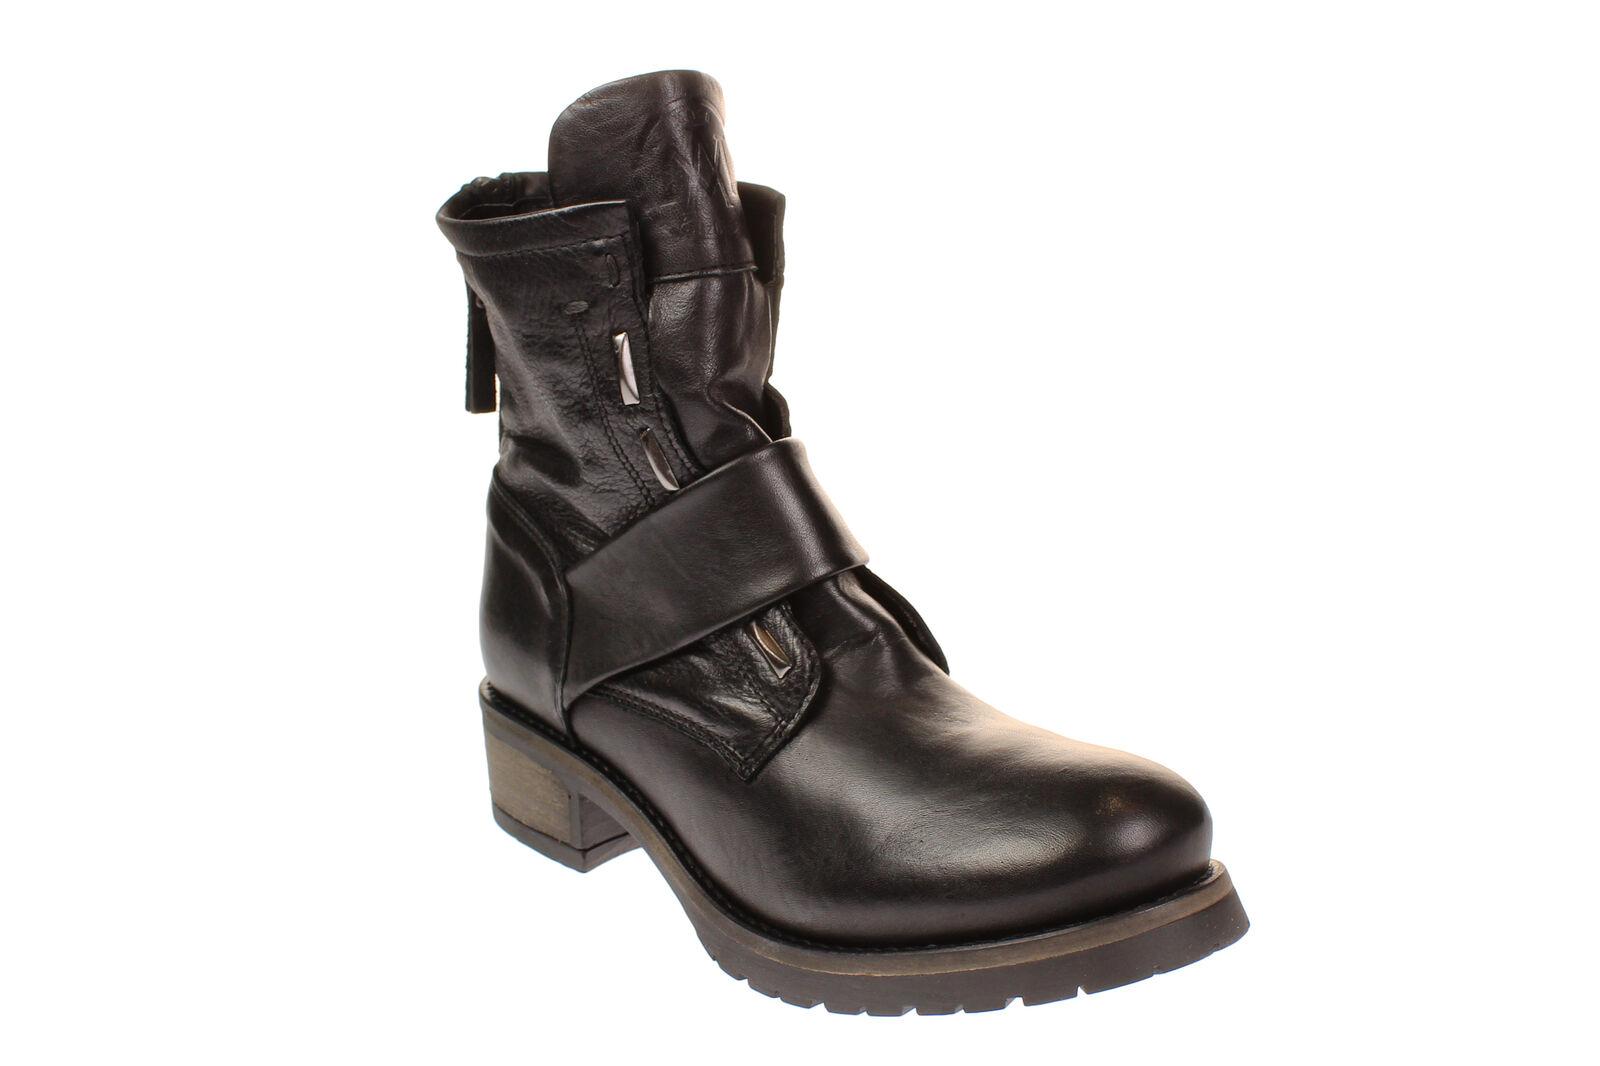 Revendication Kitzbühel 2358-FEMMES CHAUSSURES bottes bottes-noir Nappa